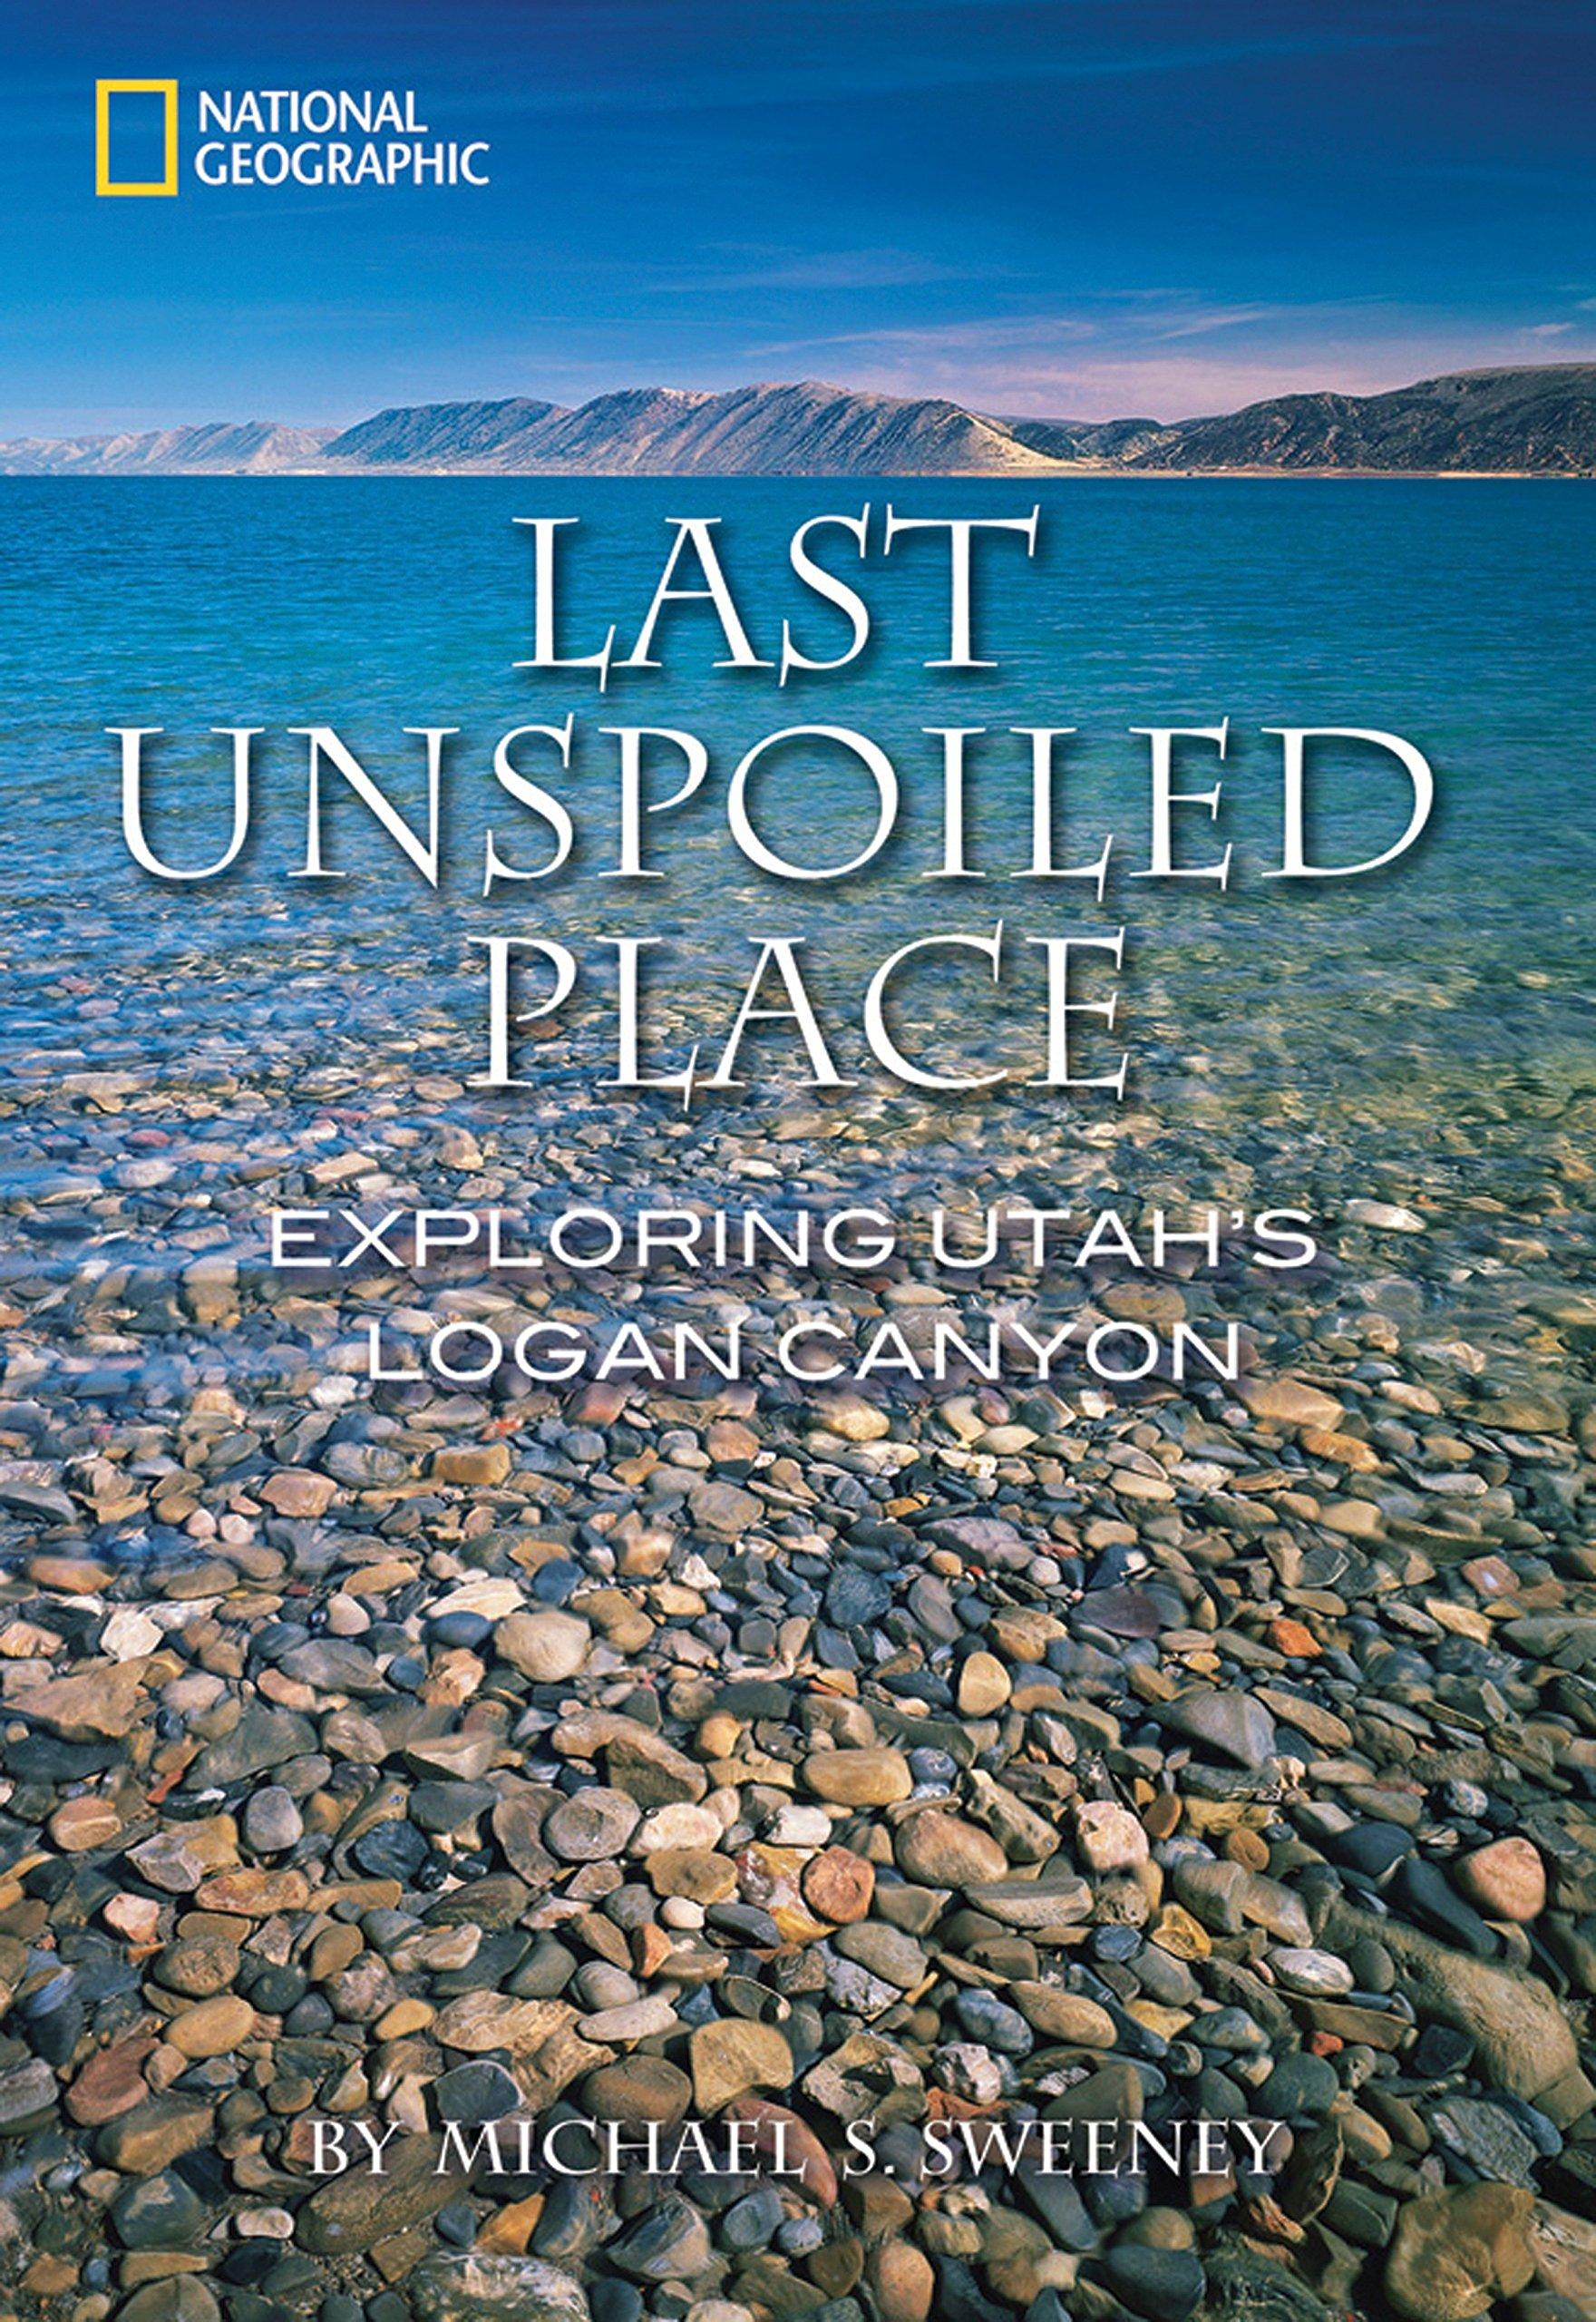 Last Unspoiled Place: Exploring Utah's Logan Canyon